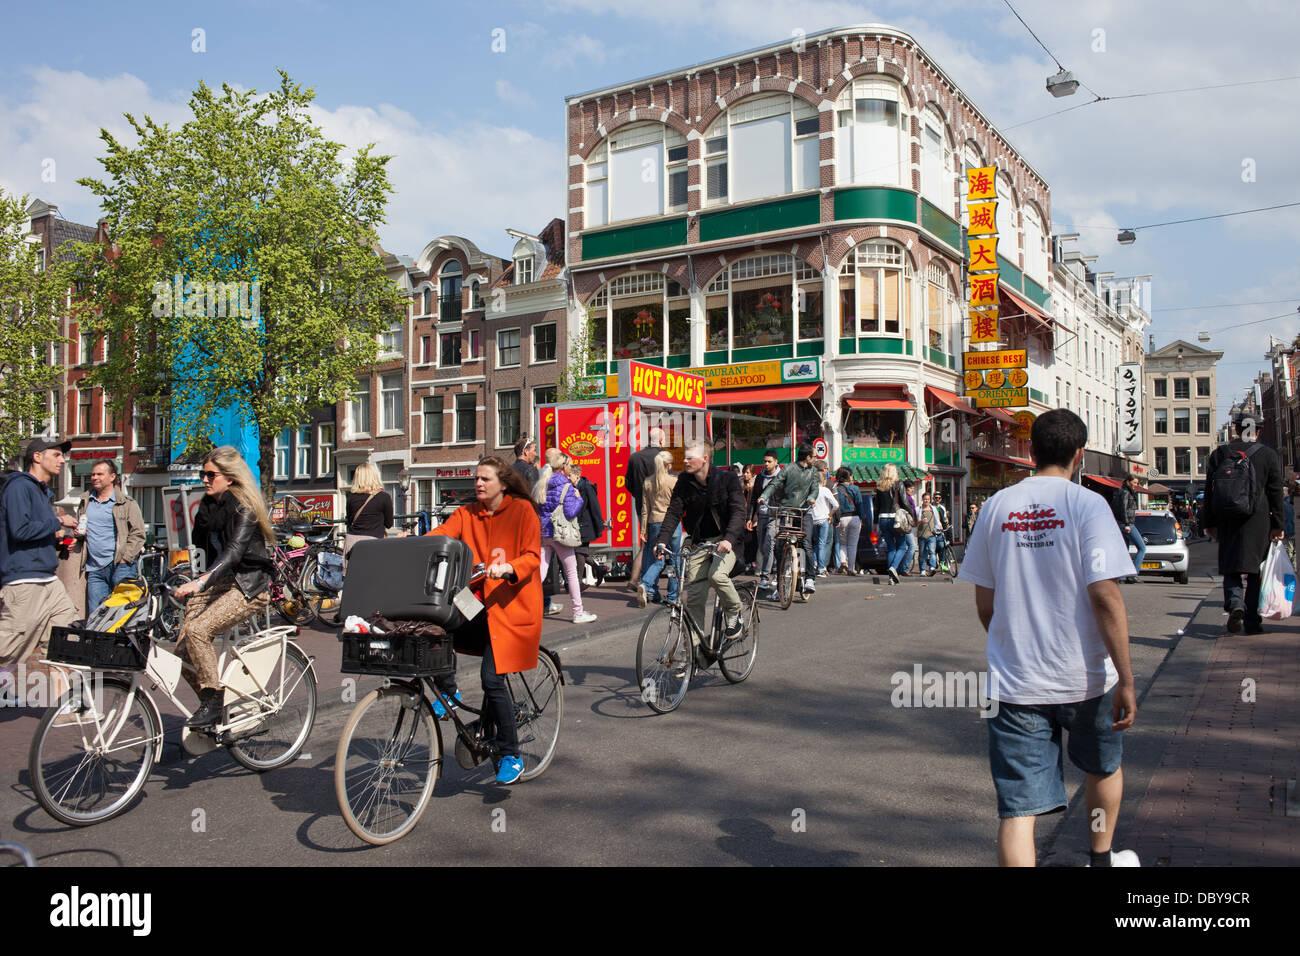 Hot Dog Amsterdam